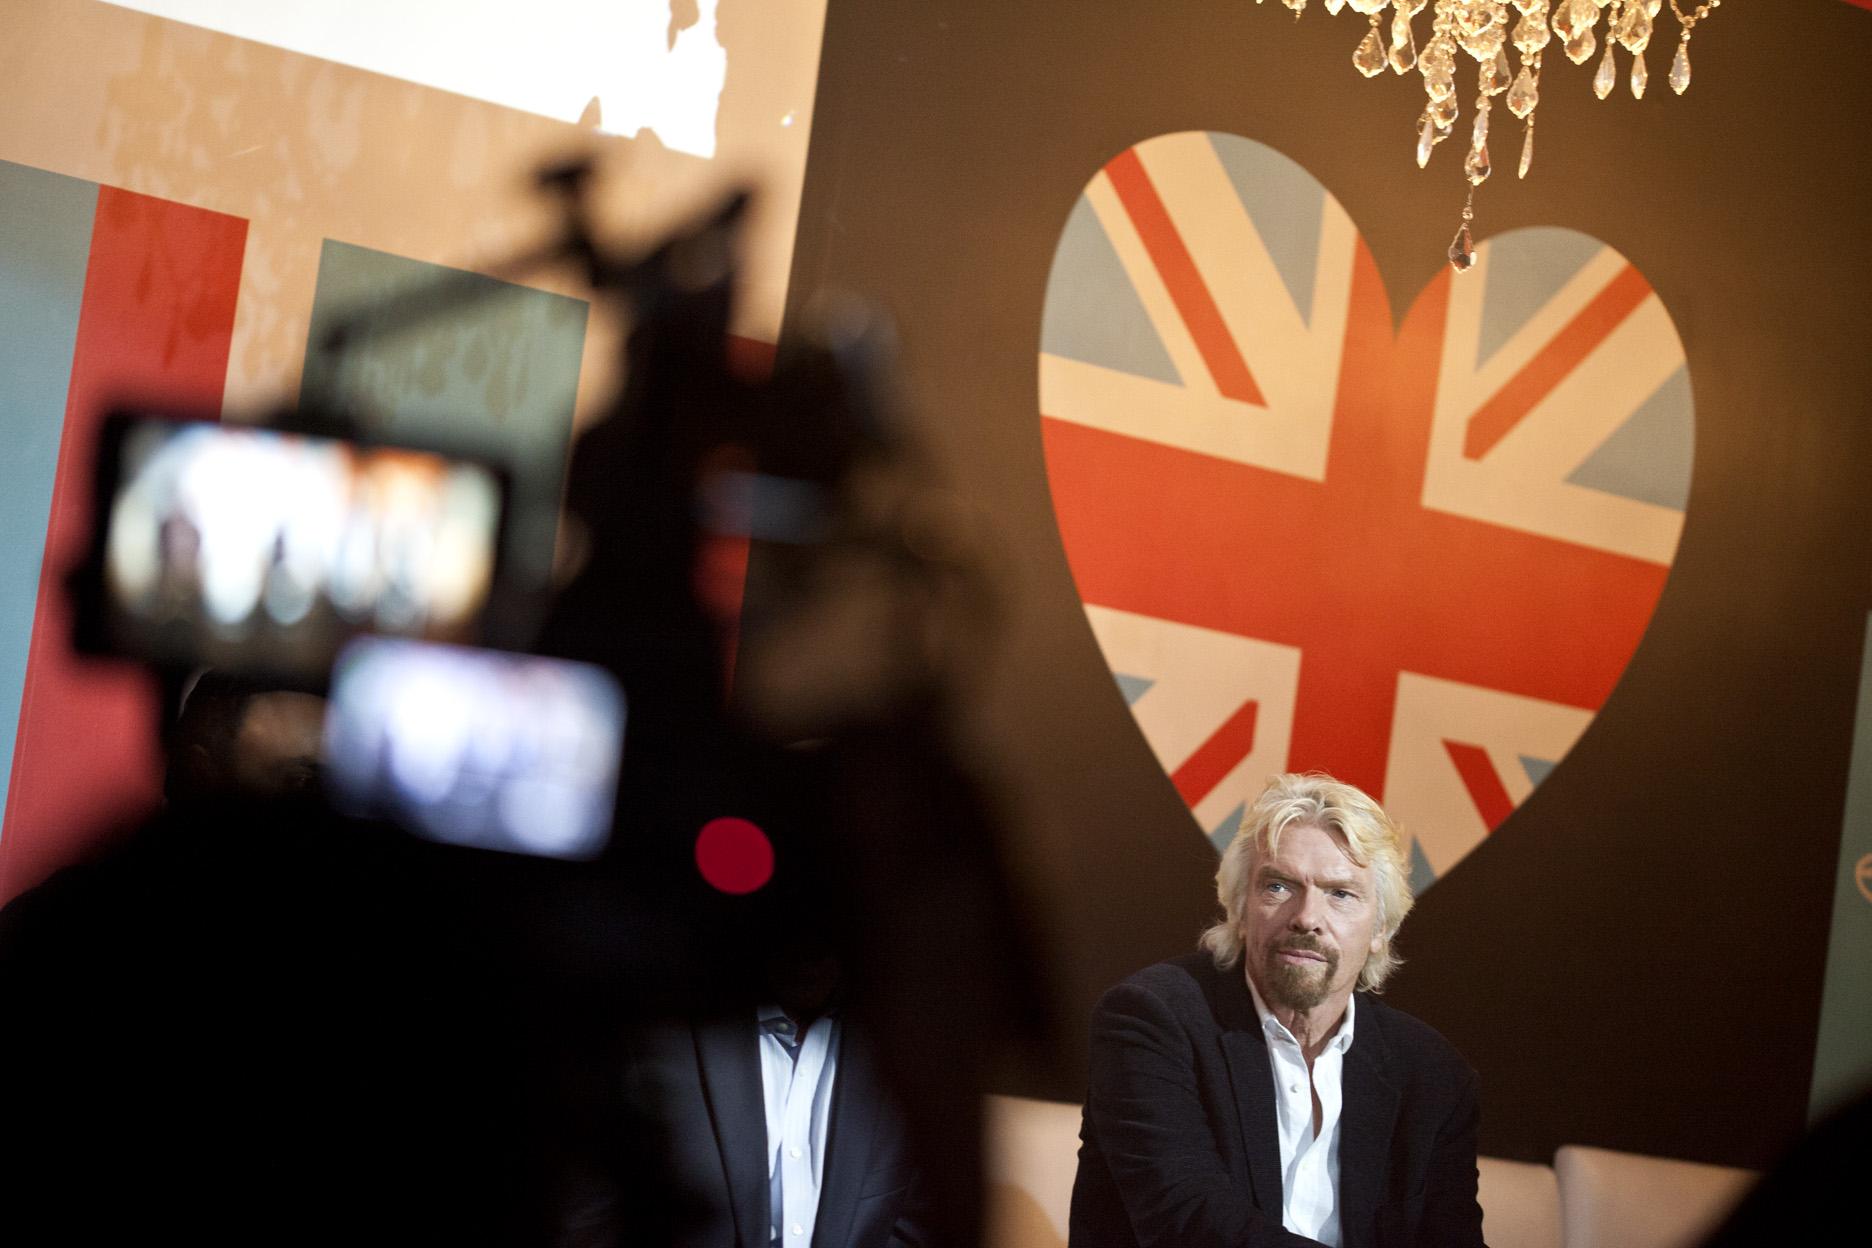 Sir Richard Branson speaks about Virgin Mobile RE*generation, at the Virgin Mod Club in Toronto, September, 2014